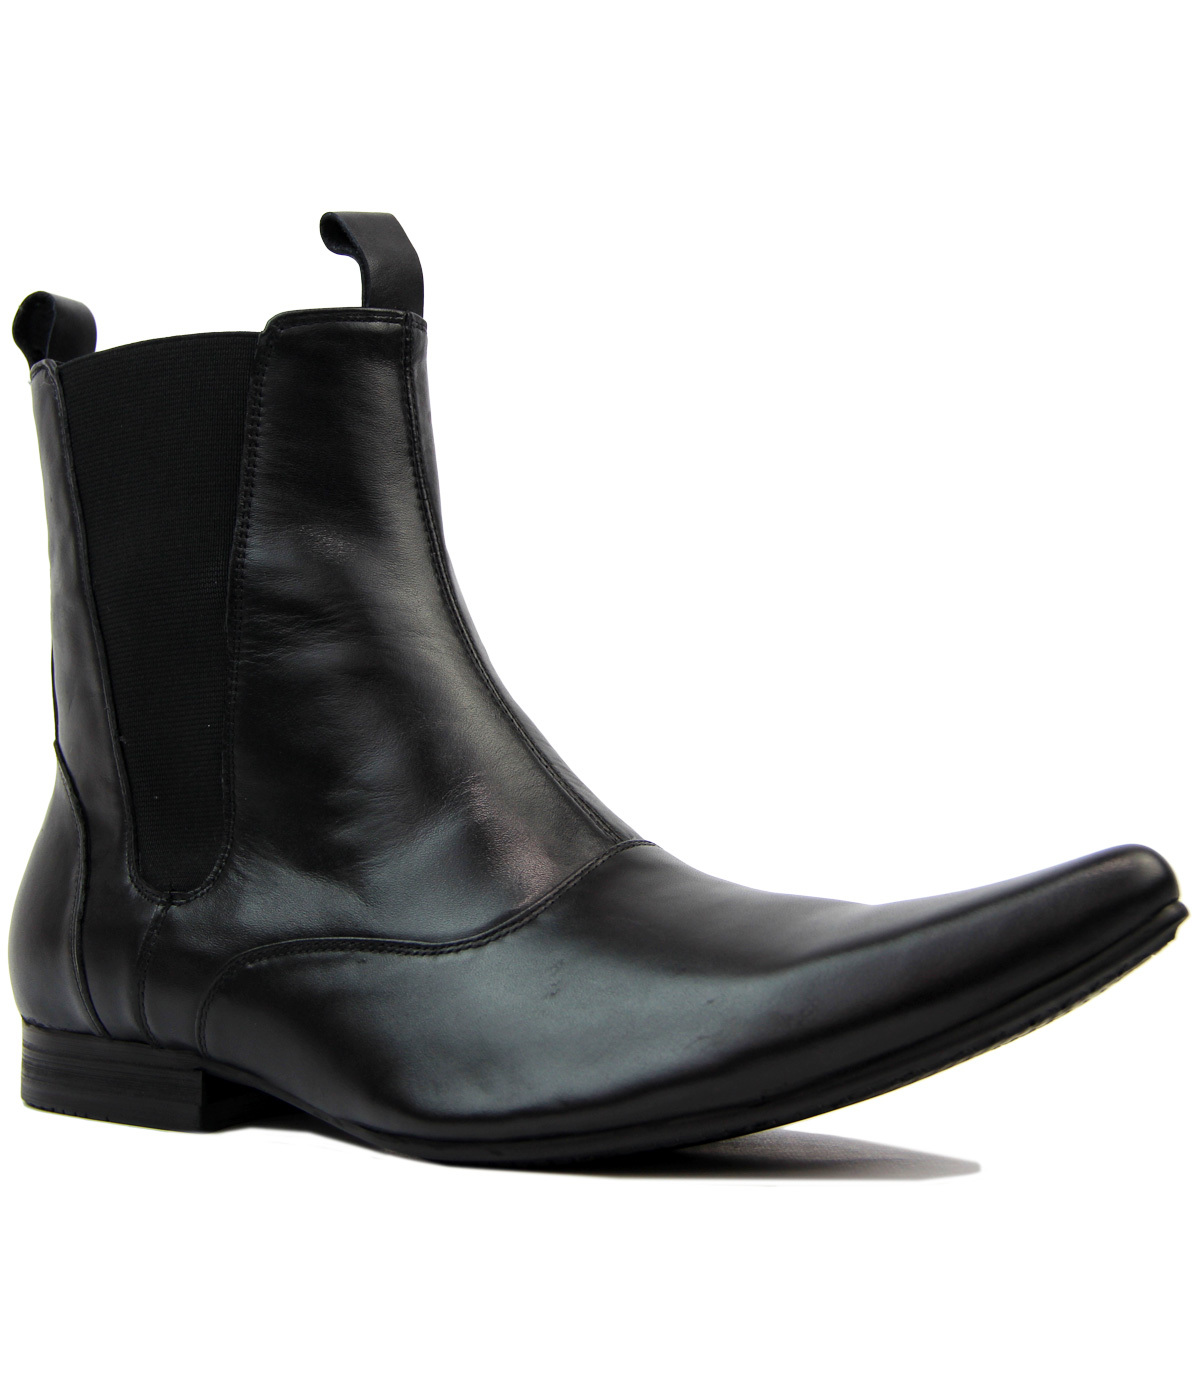 Chelsea Dagger MADCAP ENGLAND Mod Chelsea Boots